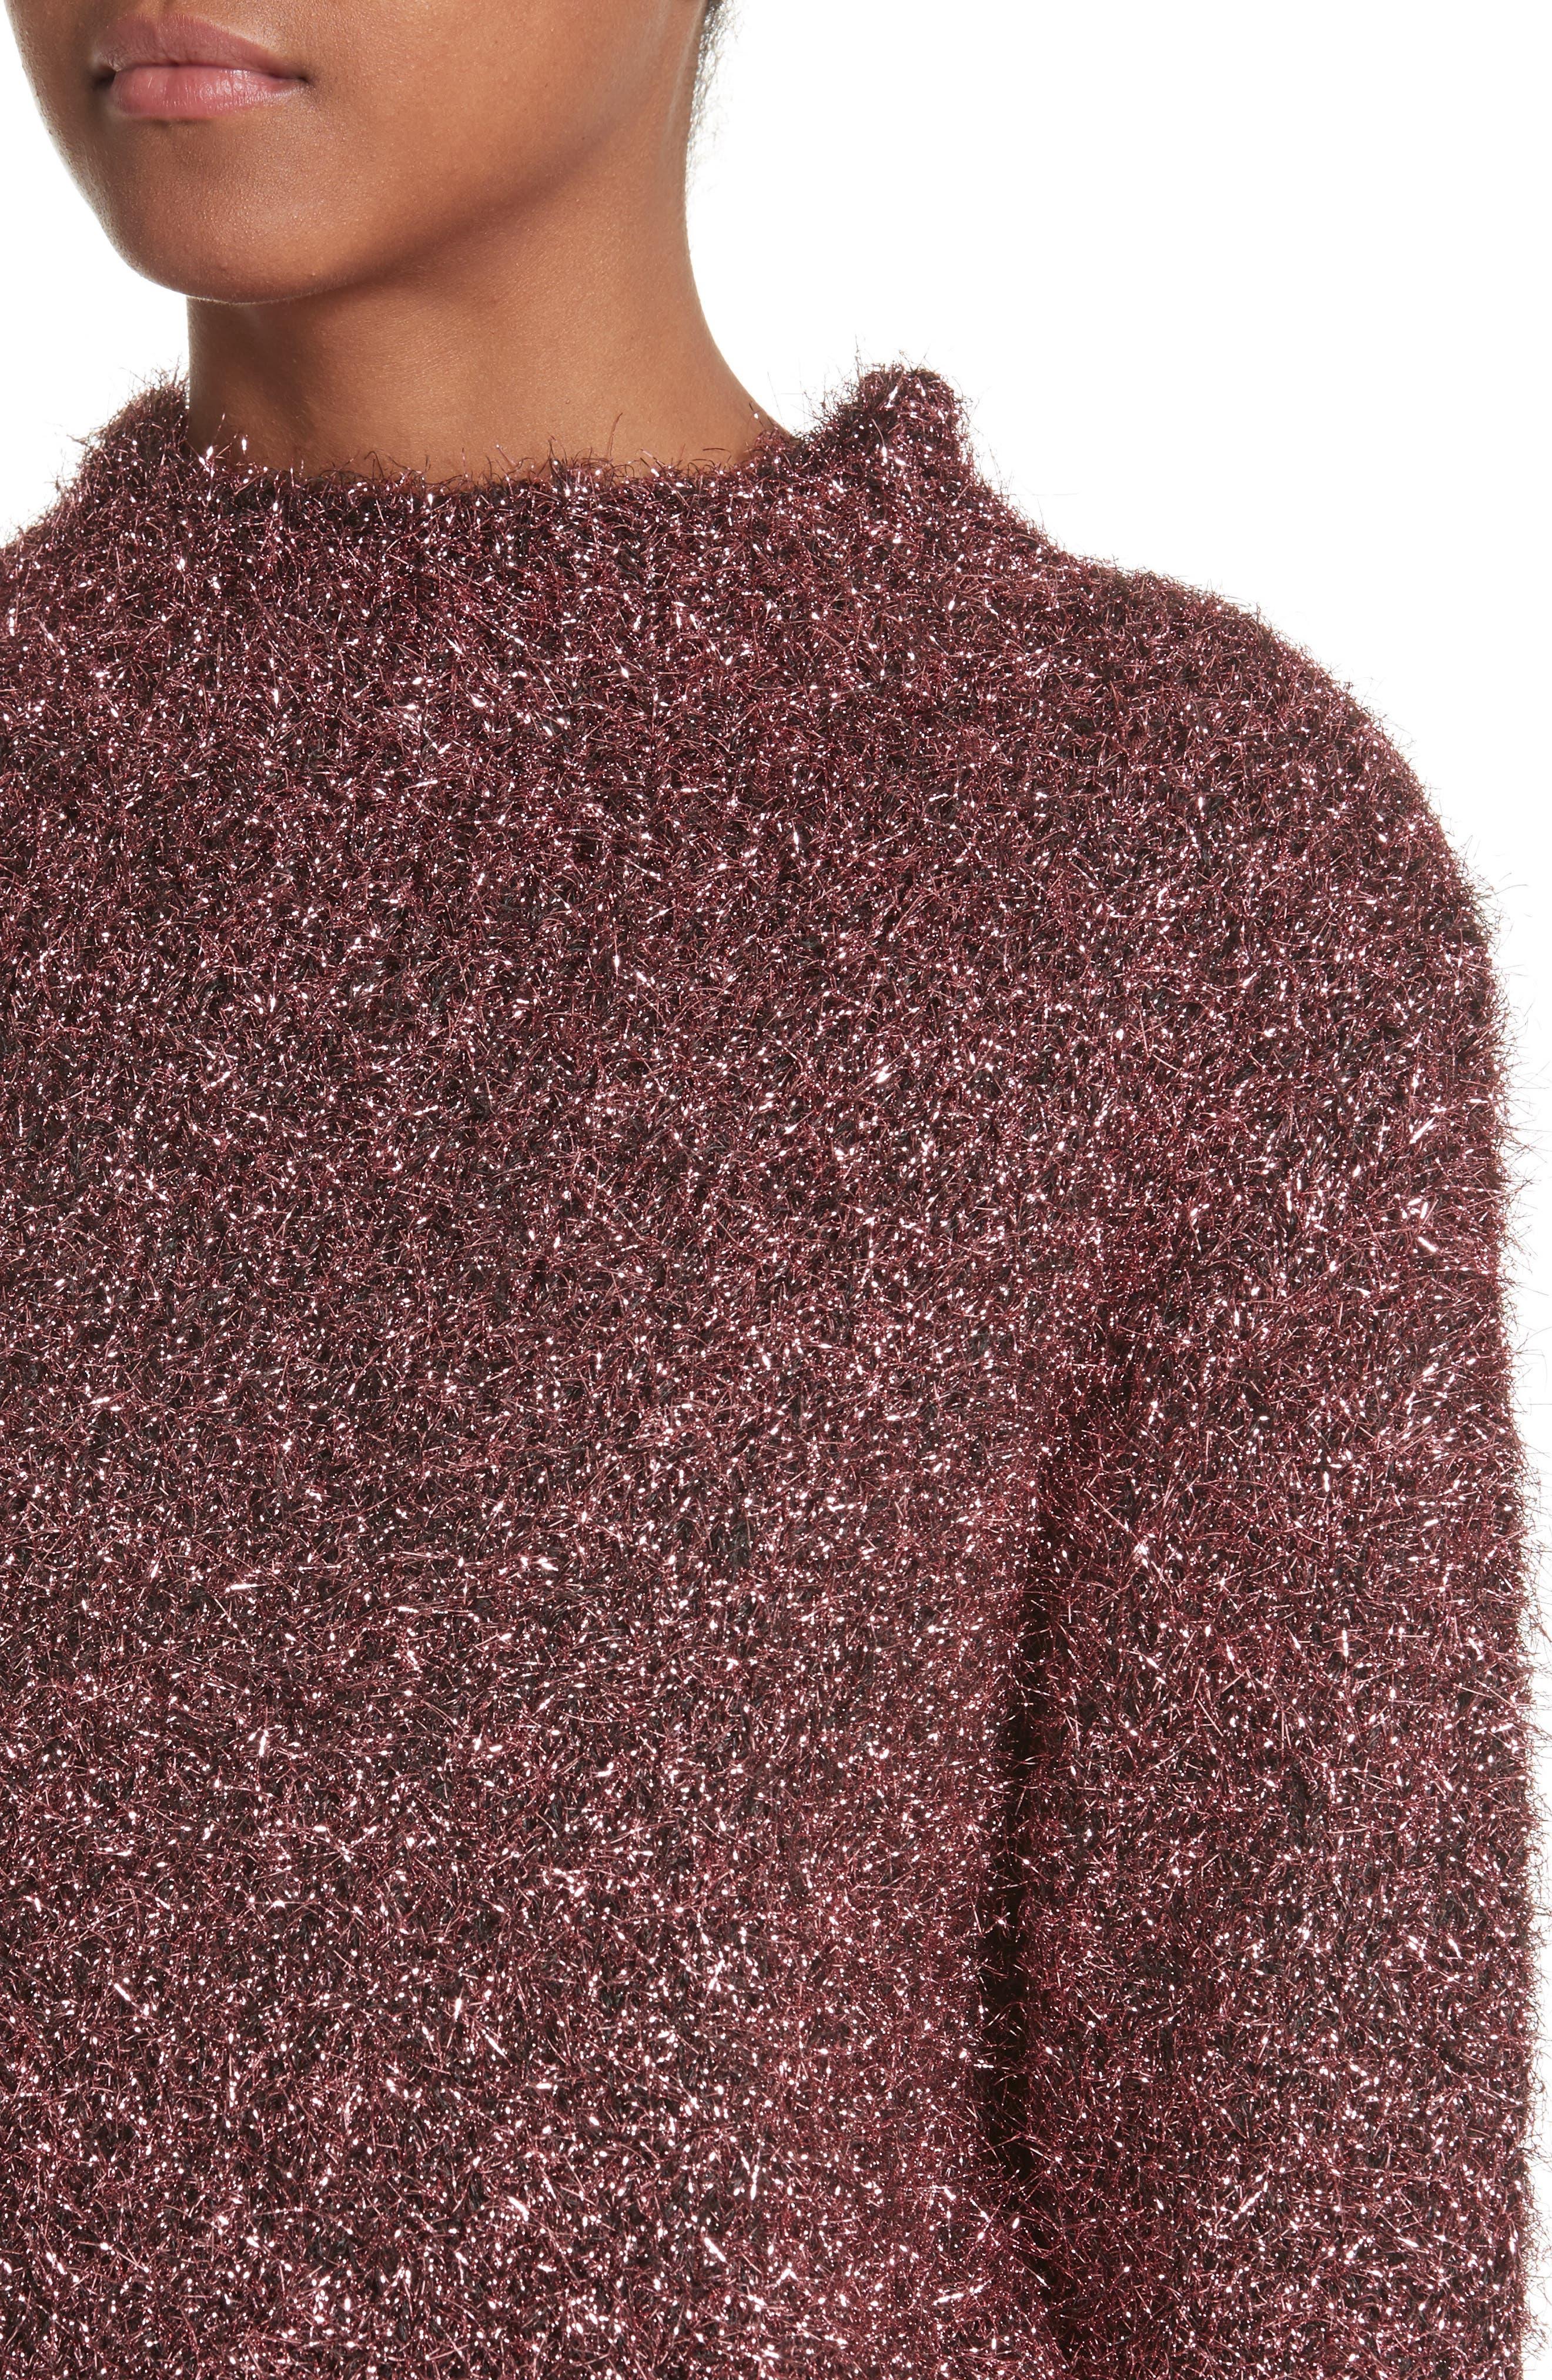 Vaporize Textured Metallic Sweater,                             Alternate thumbnail 4, color,                             Pink